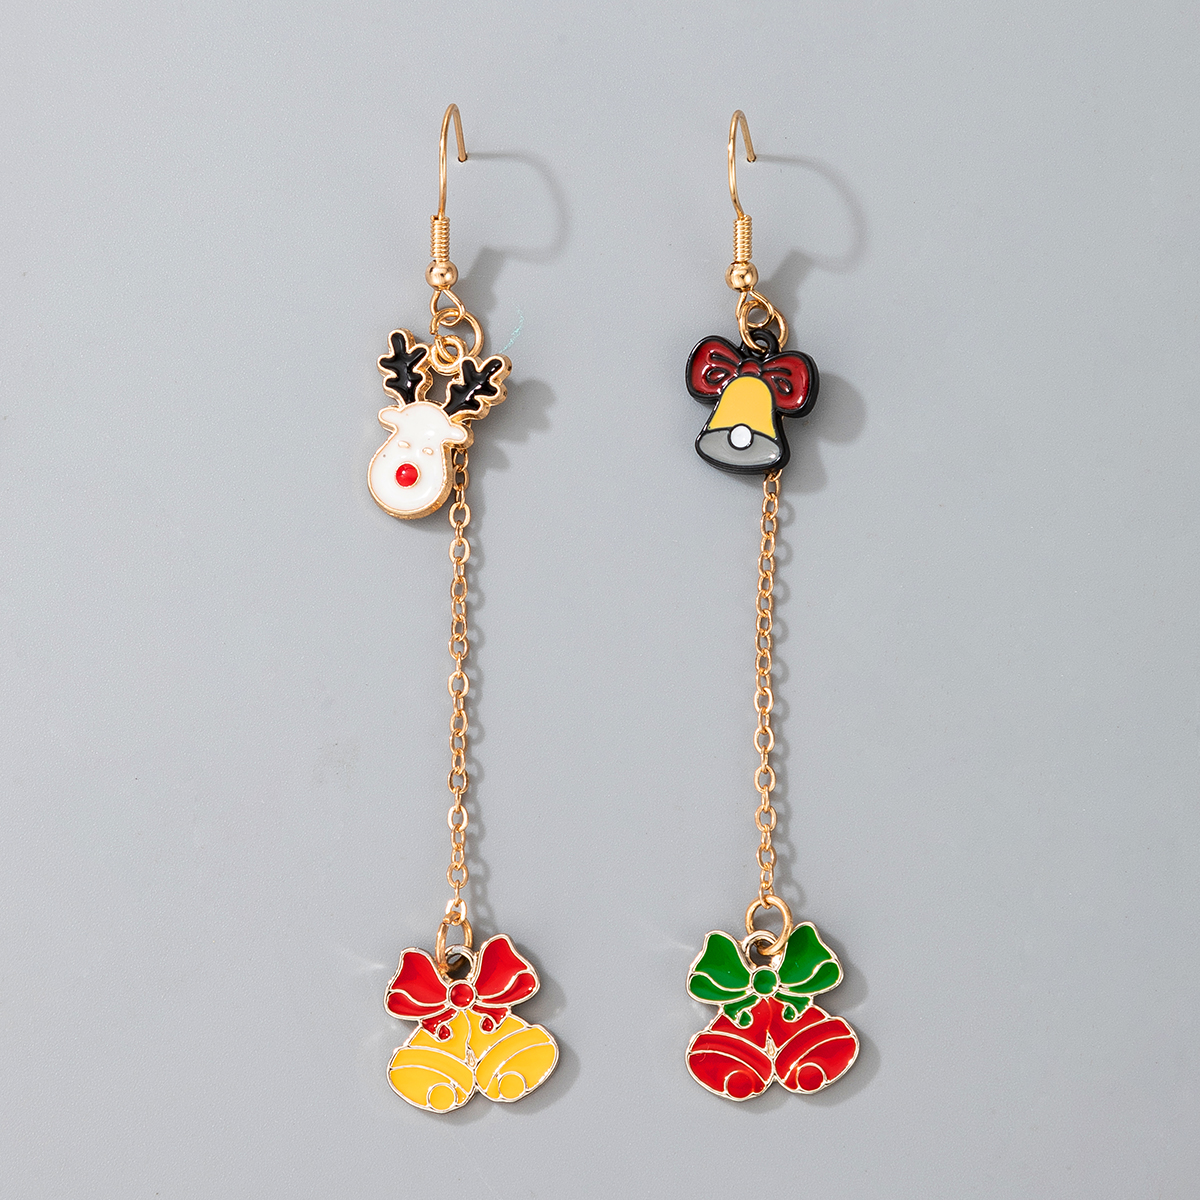 Retro Cute Christmas Fawn Bell Earrings Knot Elk Jingle Earrings  NHGY285680